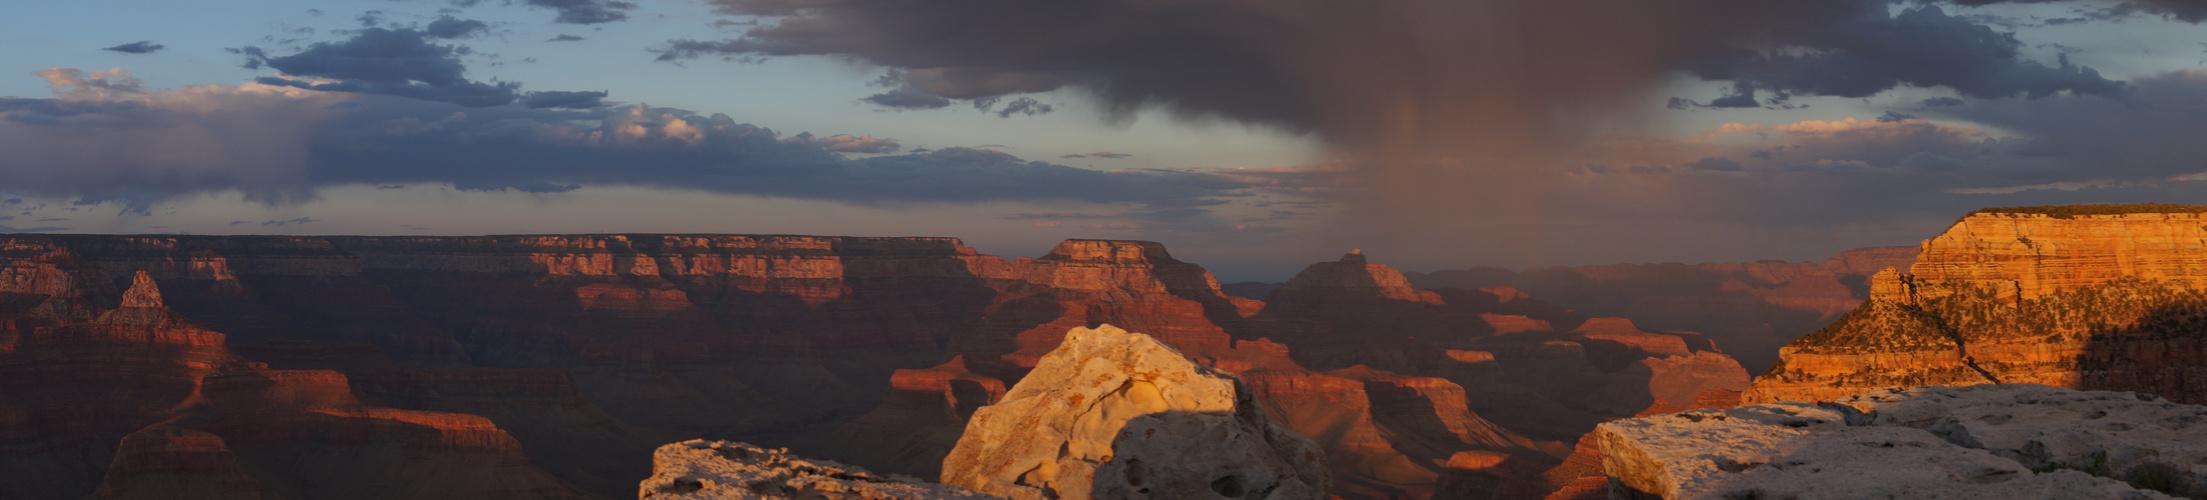 Gewitterfront über Grand Canyon